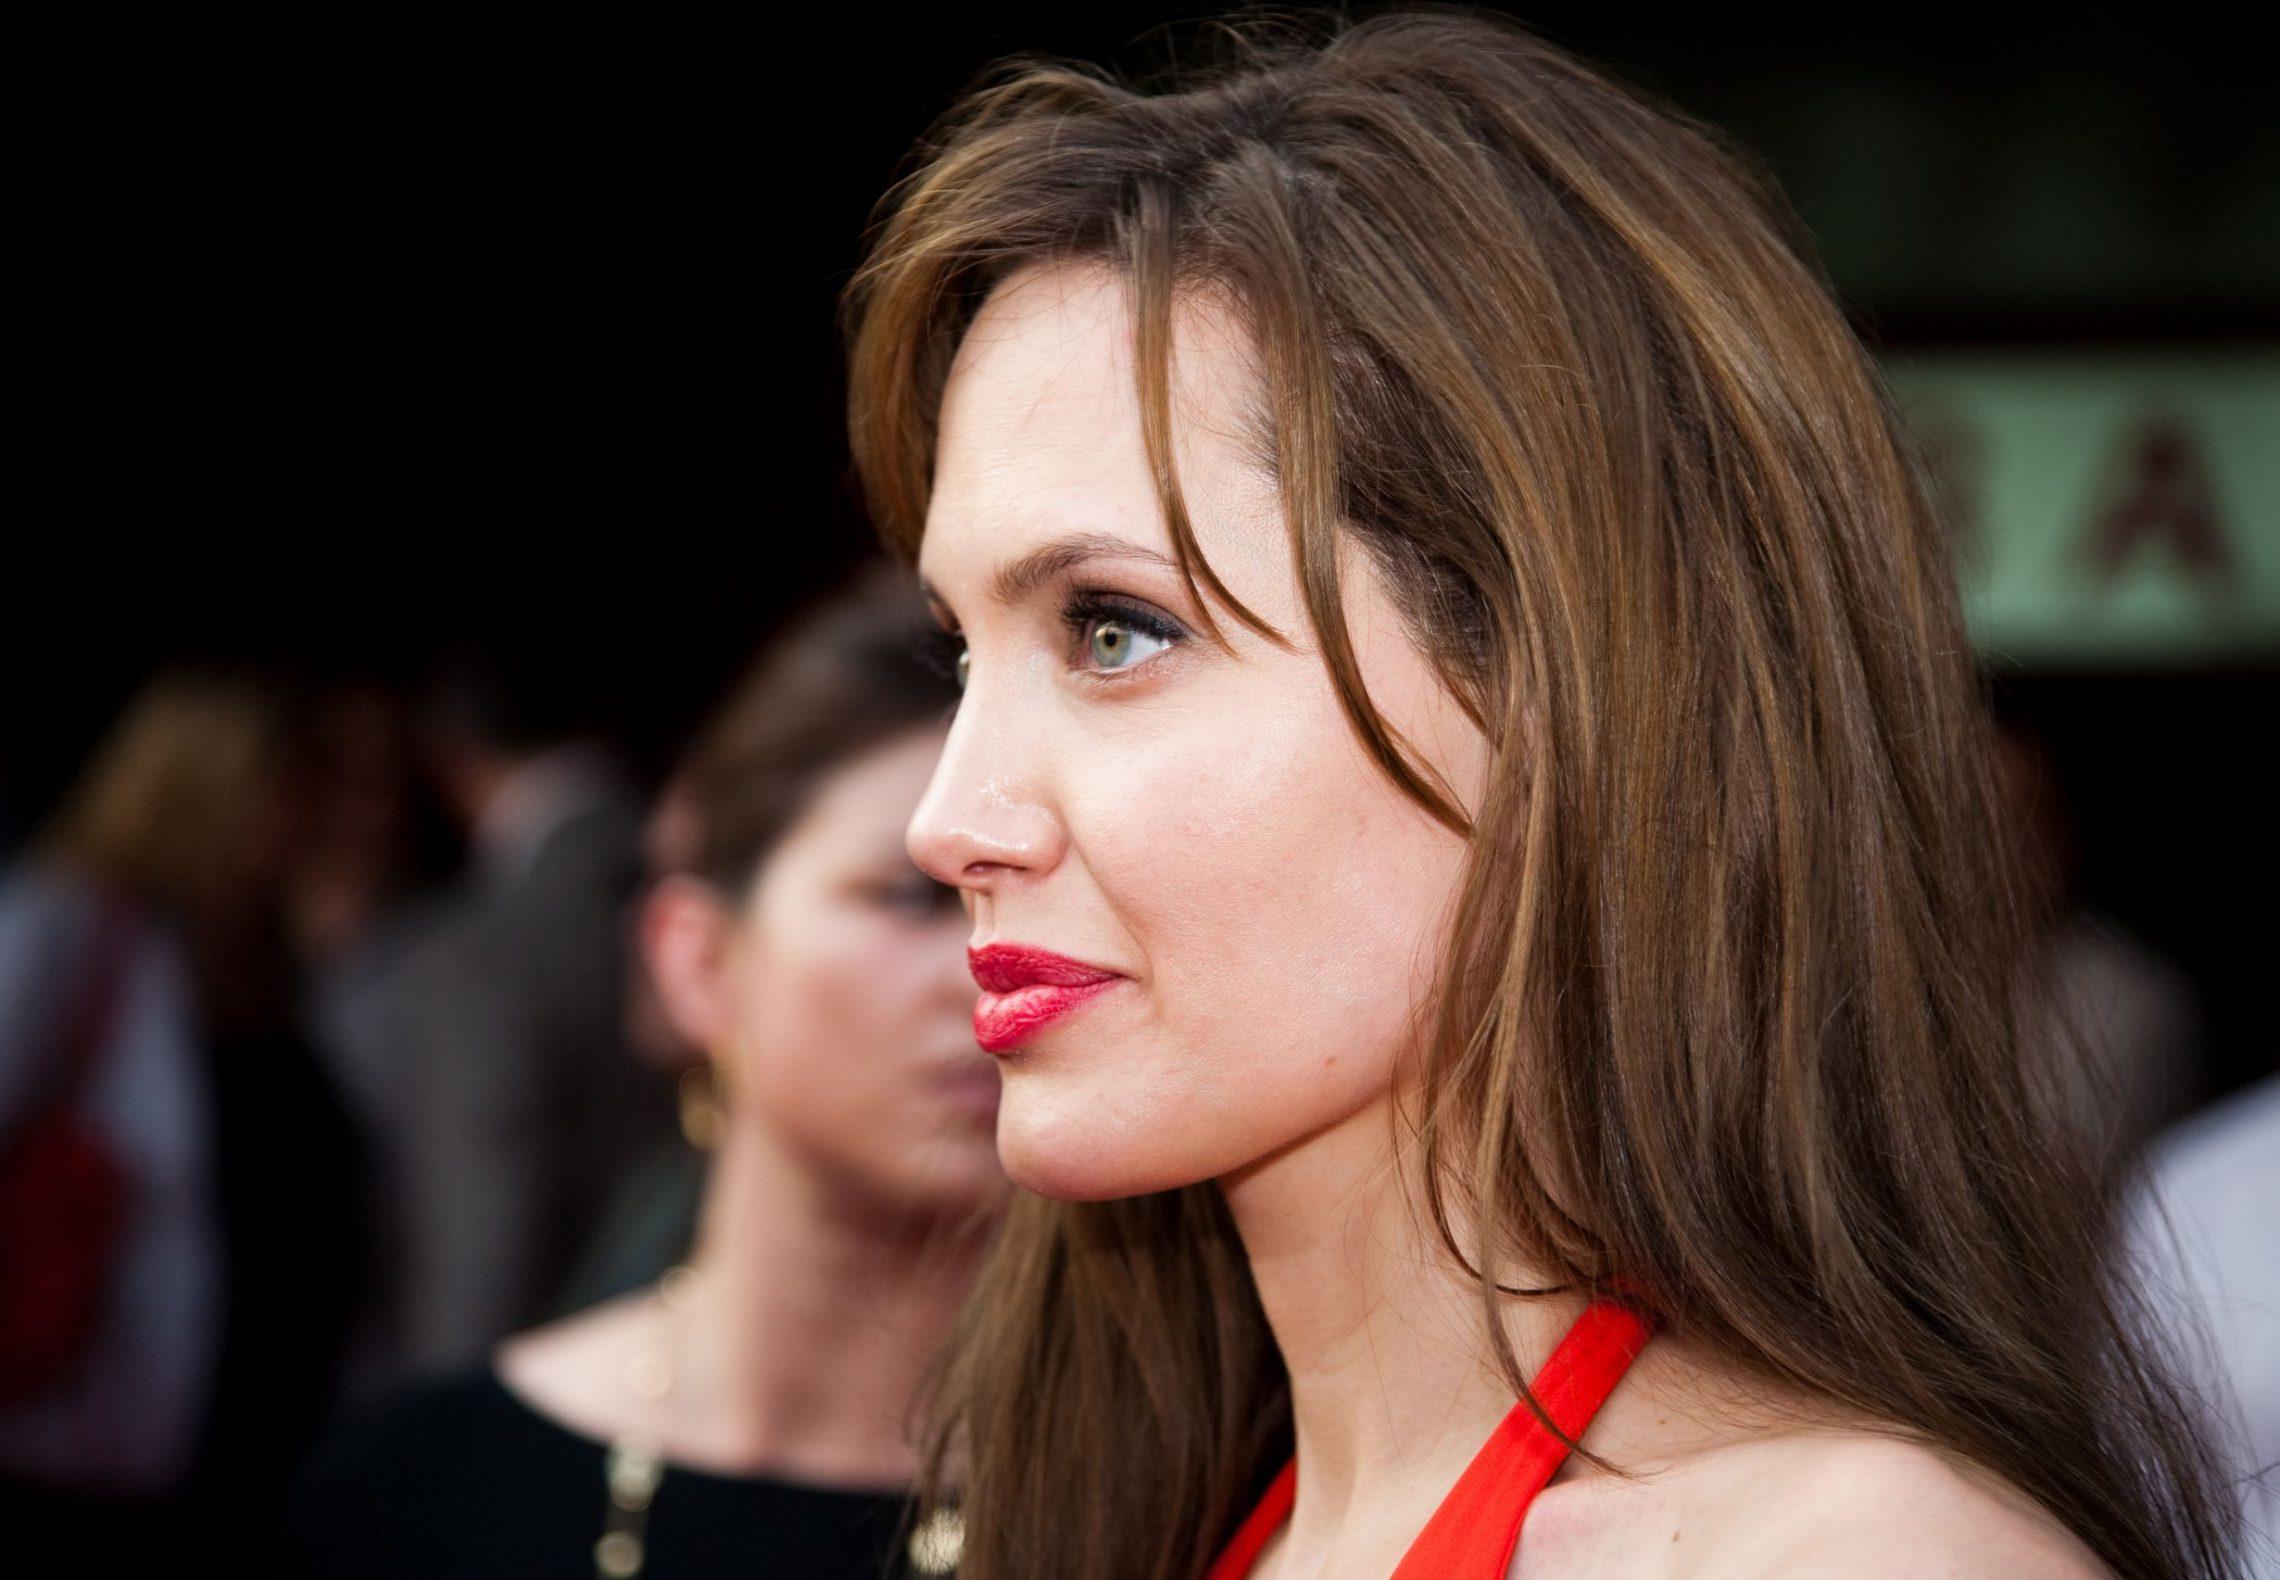 Angelina Jolie – mama, aktorka, reżyserka